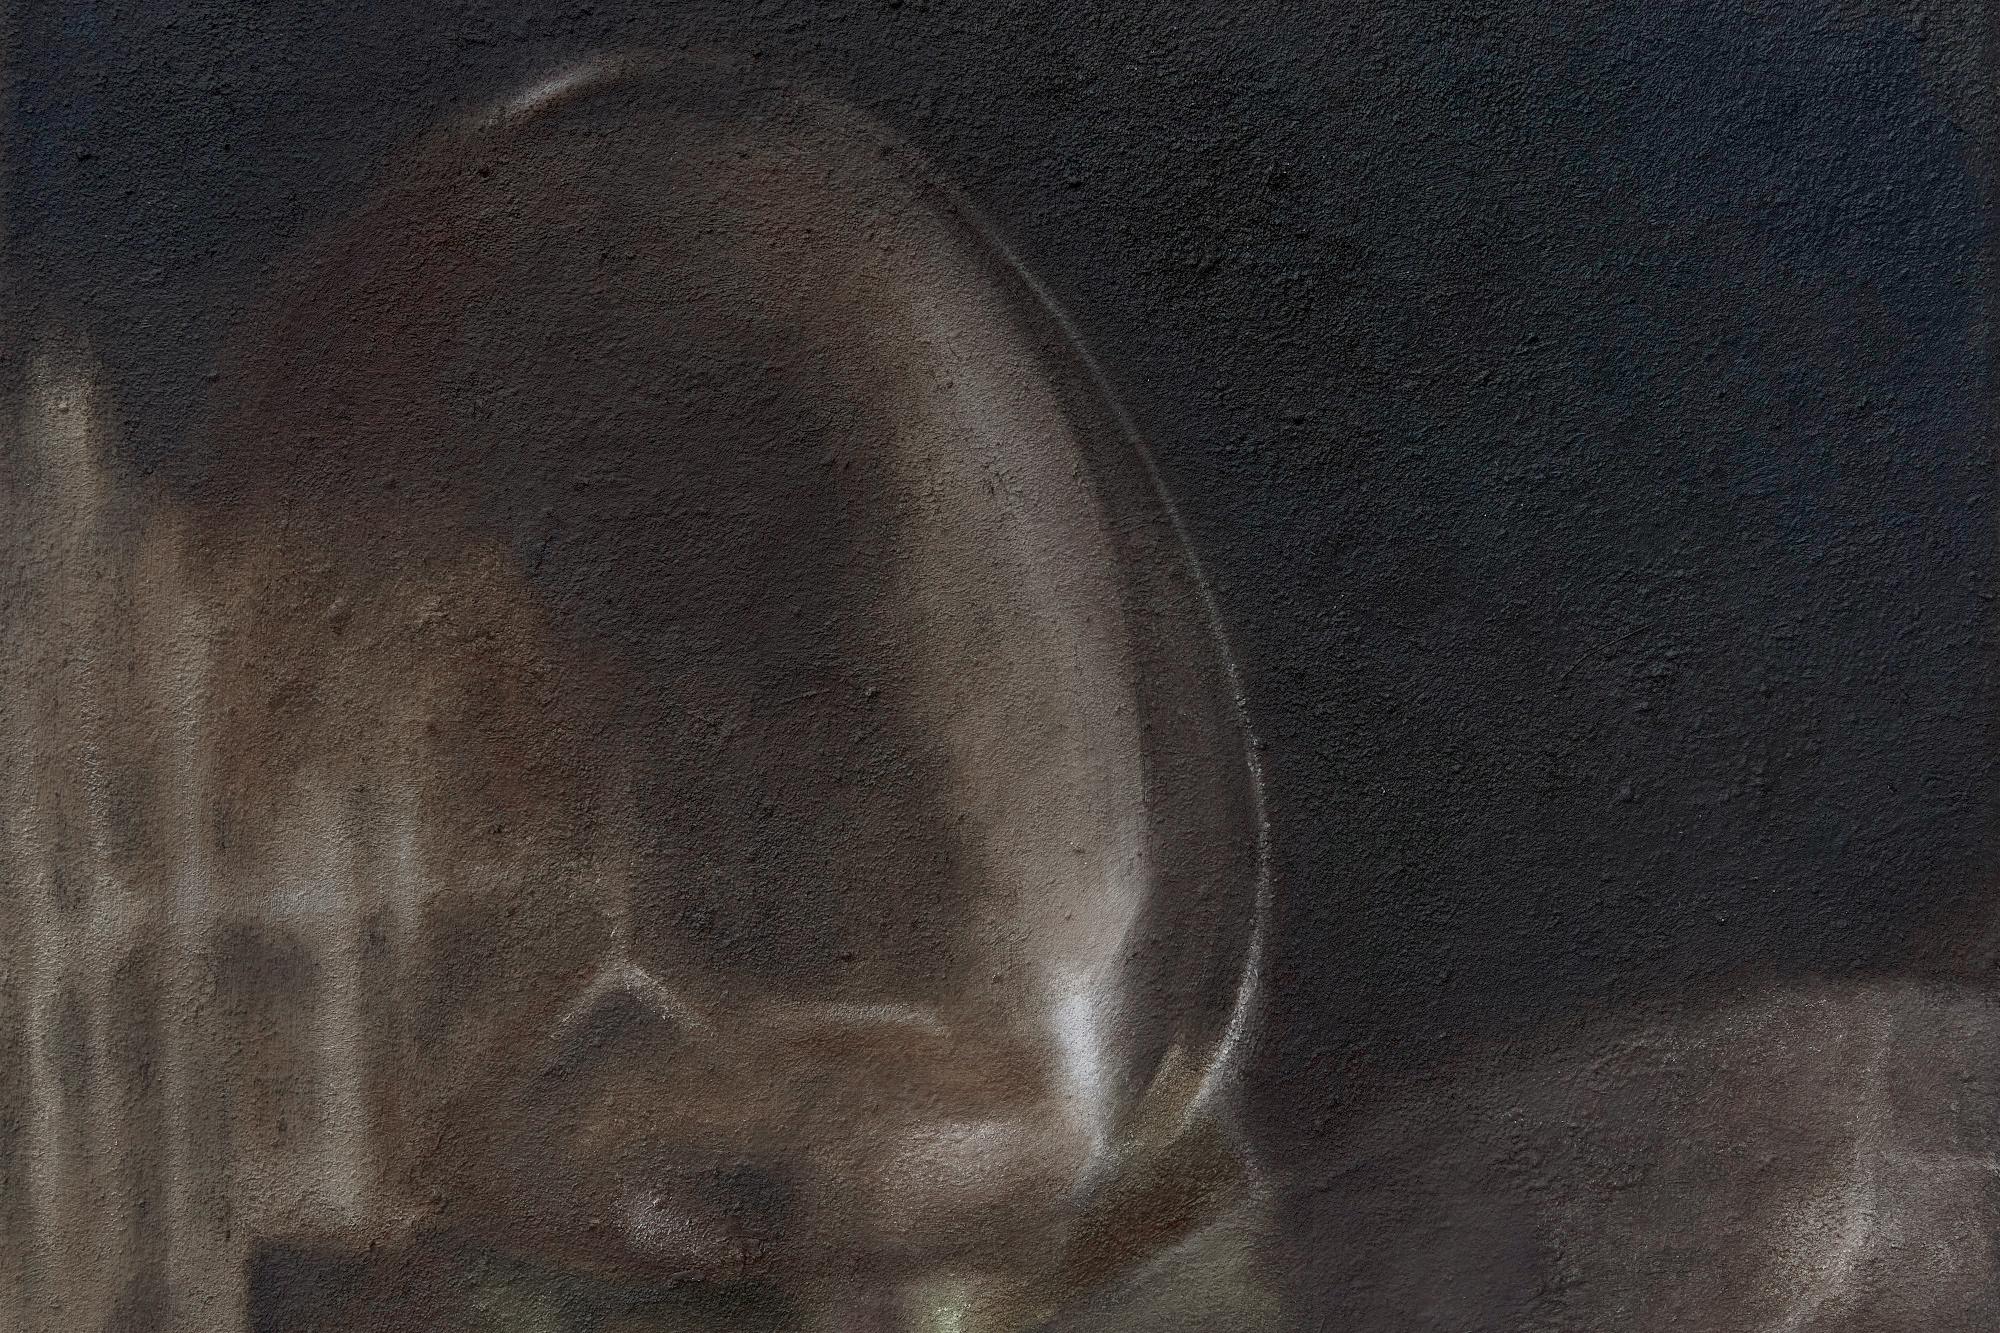 Kin-ting Li, 'Hidden path', 2021. Oil on canvas, 30 x 40 cm. photo: Corey Bartle Sanderson